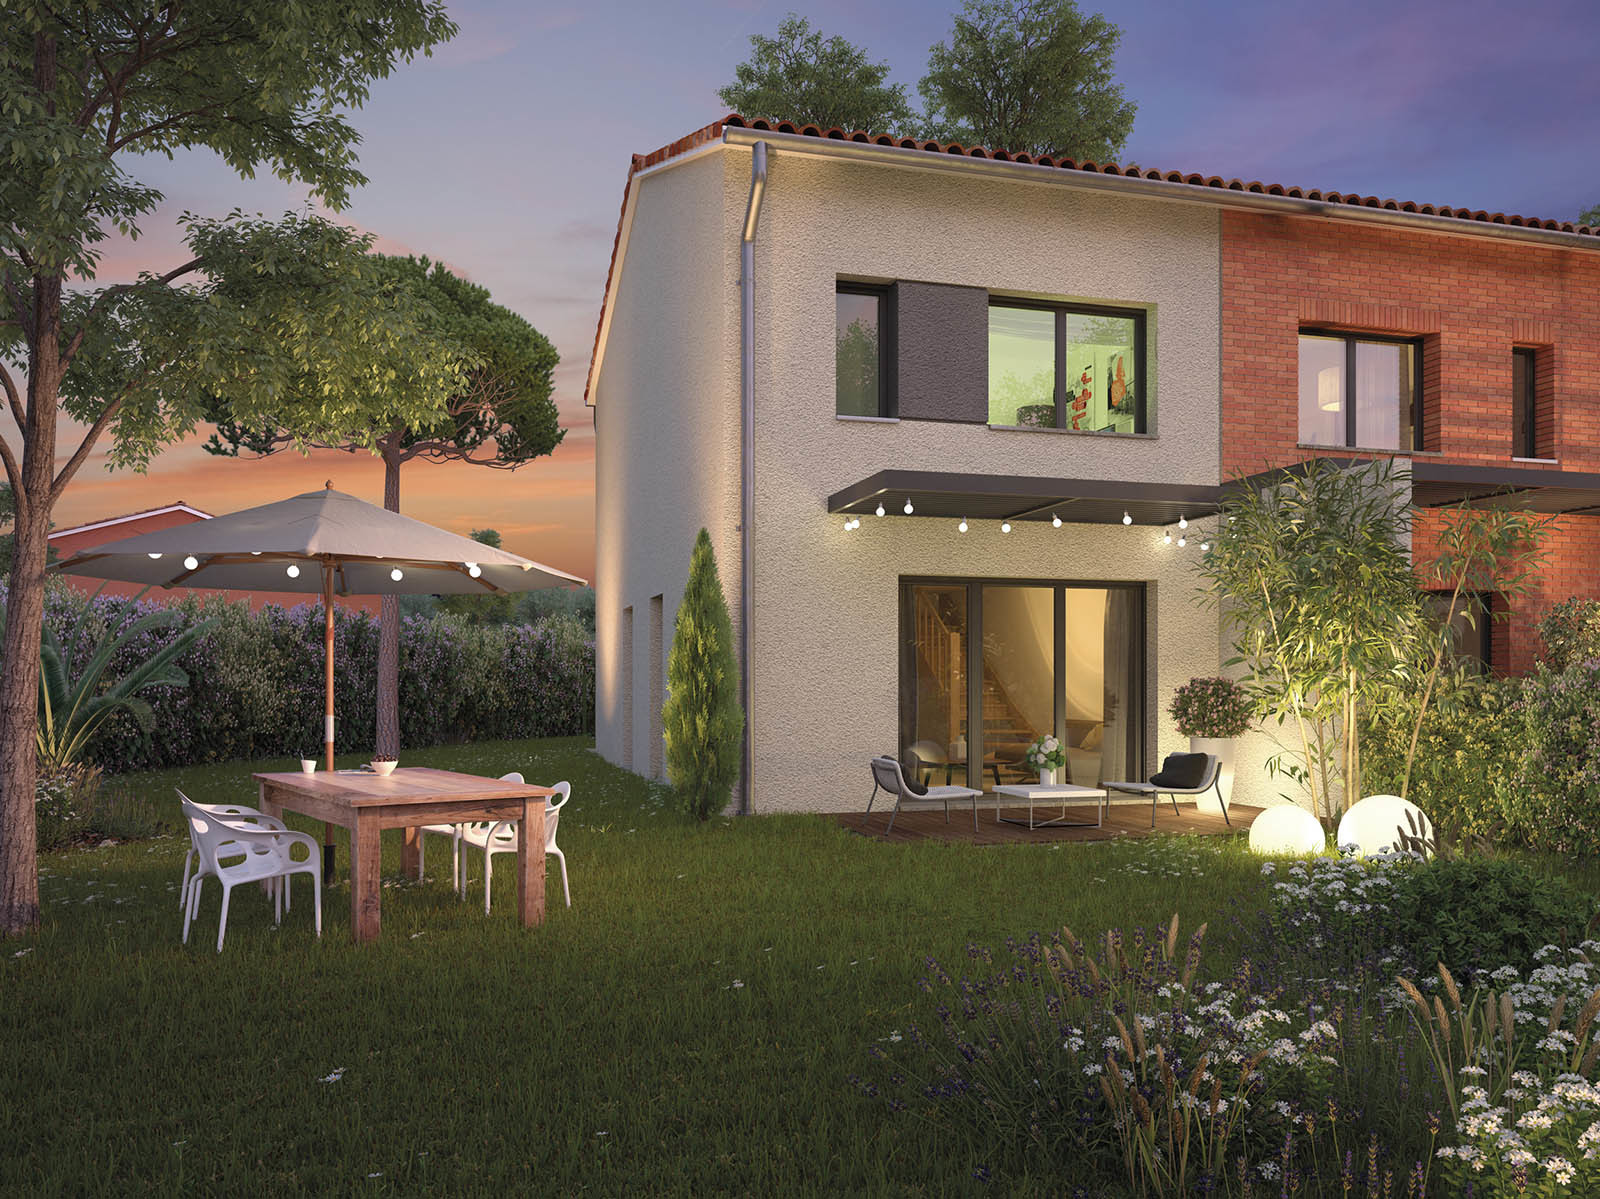 Programme immobilier les villas d t castanet tolosan Salon jardin villa esmeralda tultitlan